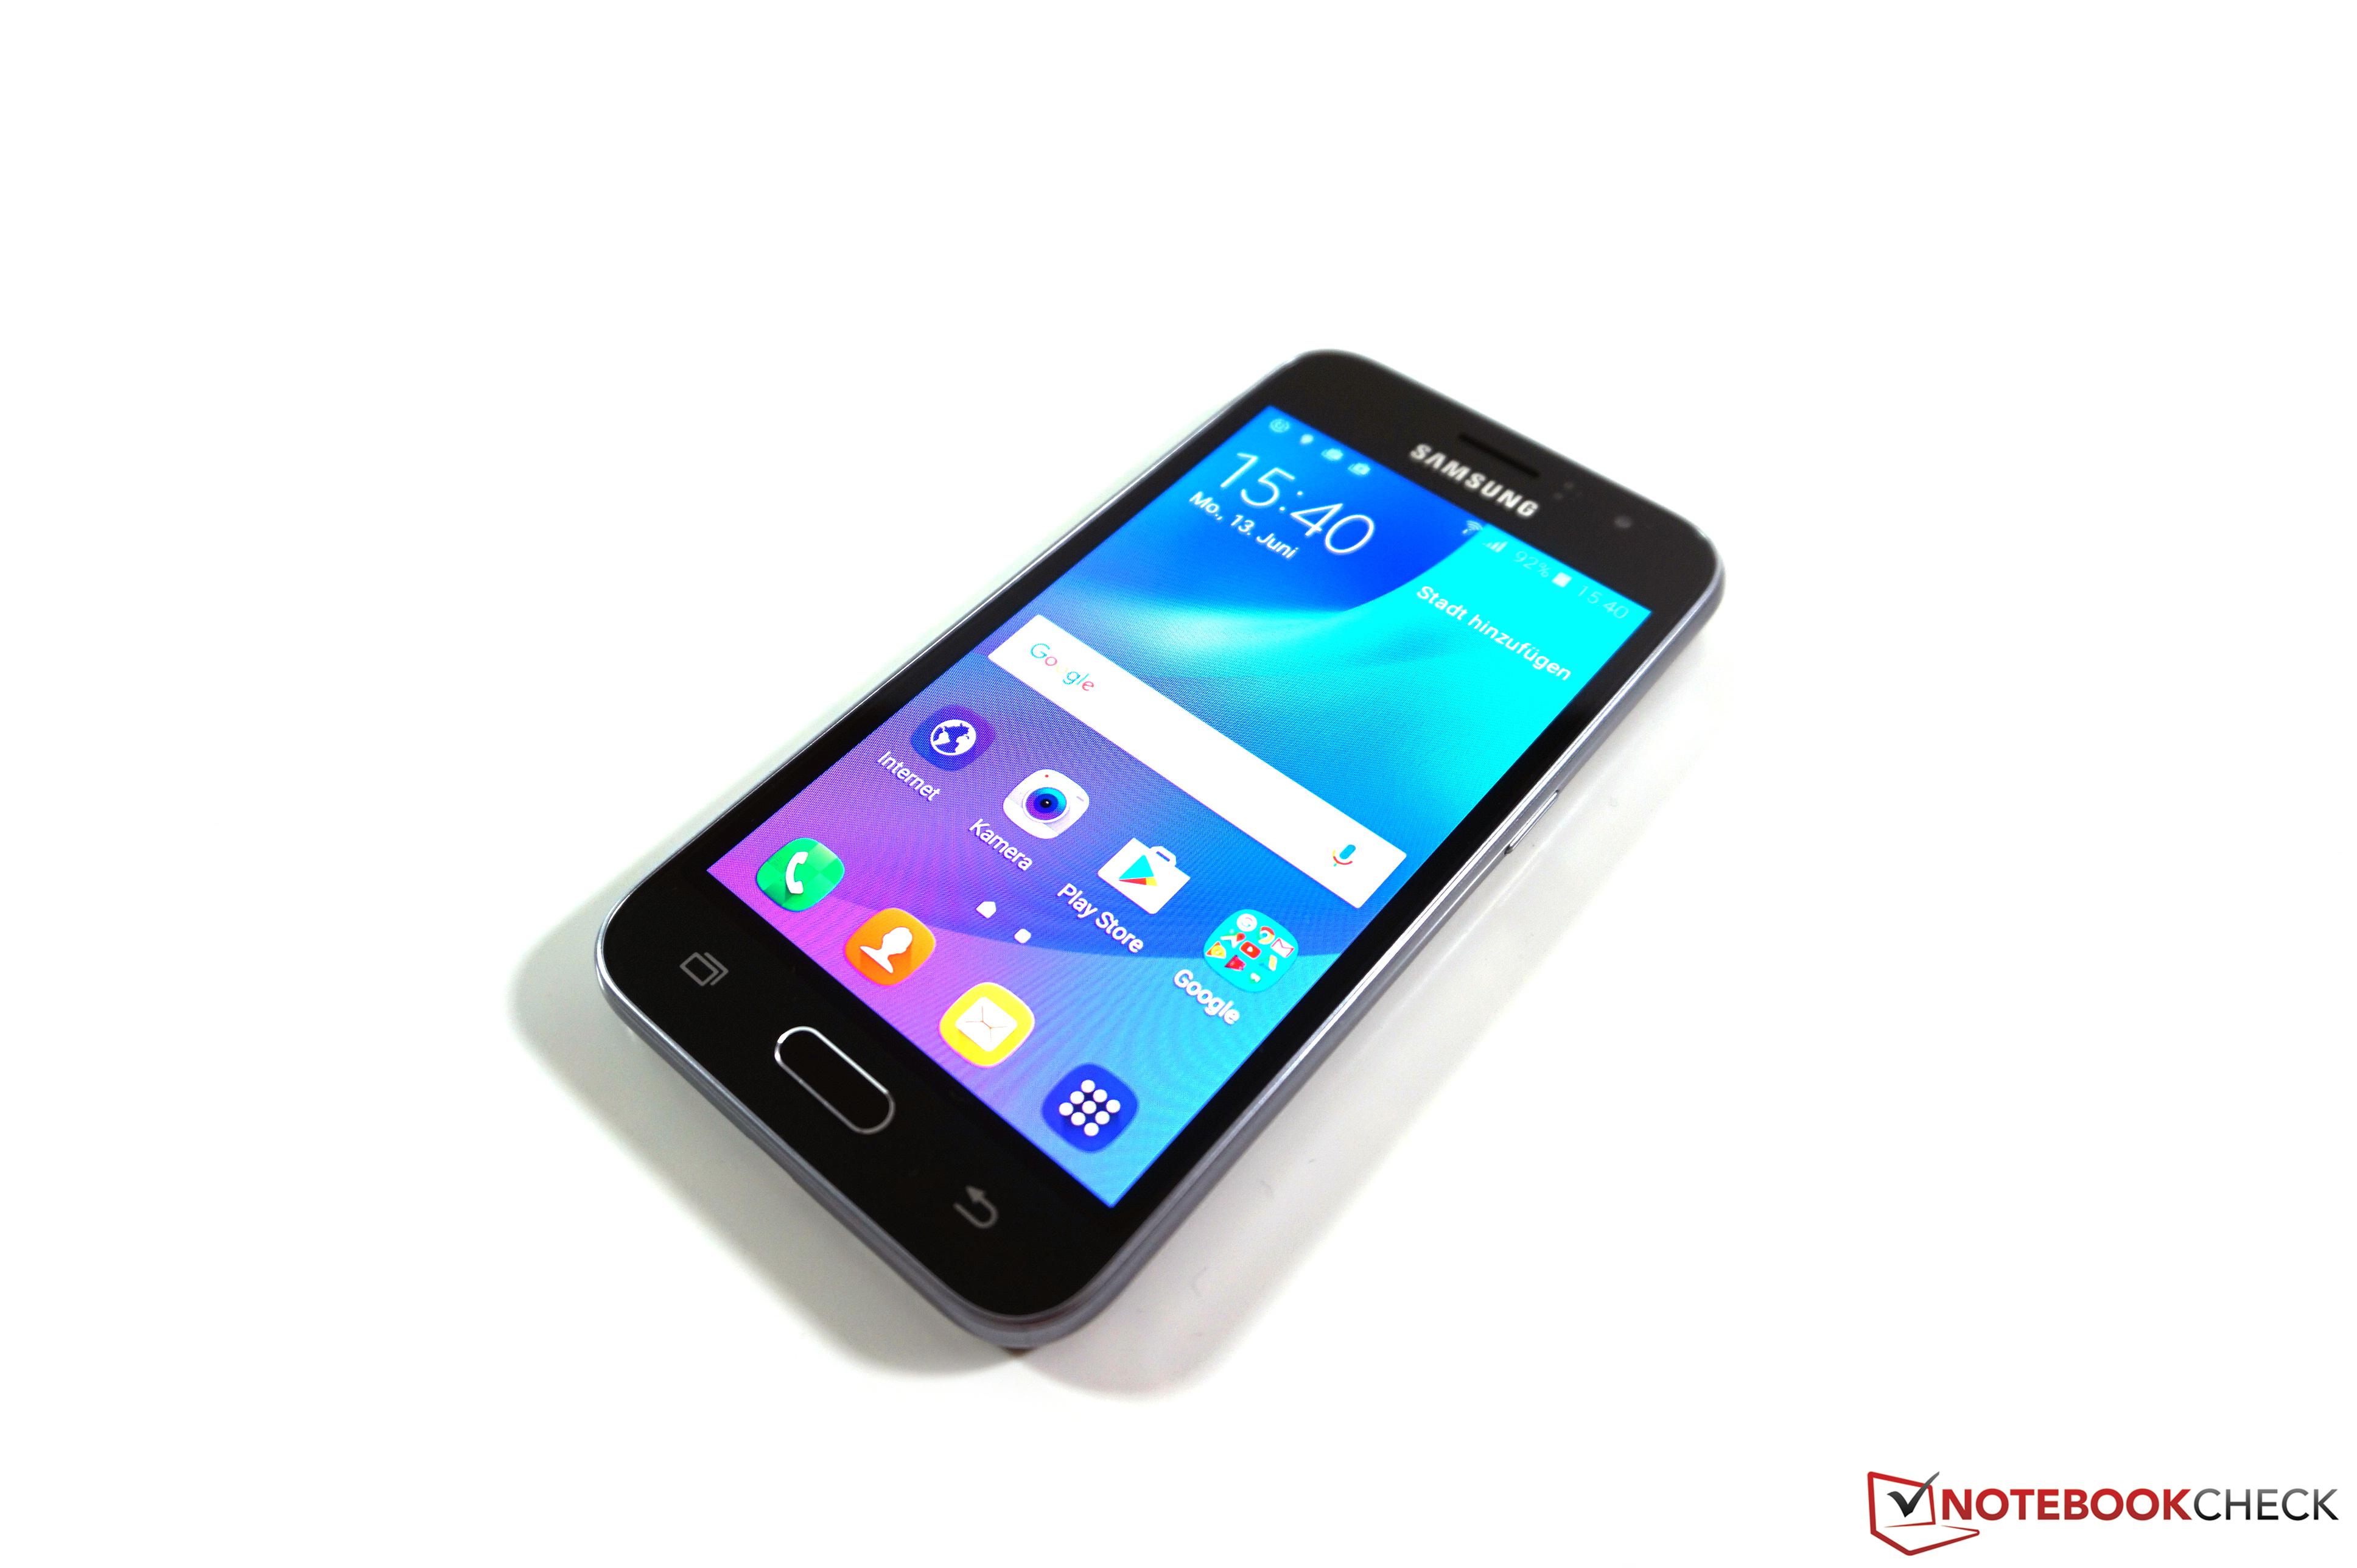 Samsung Galaxy J1 2016 Smartphone Review Reviews J100 4 Gb Full Resolution